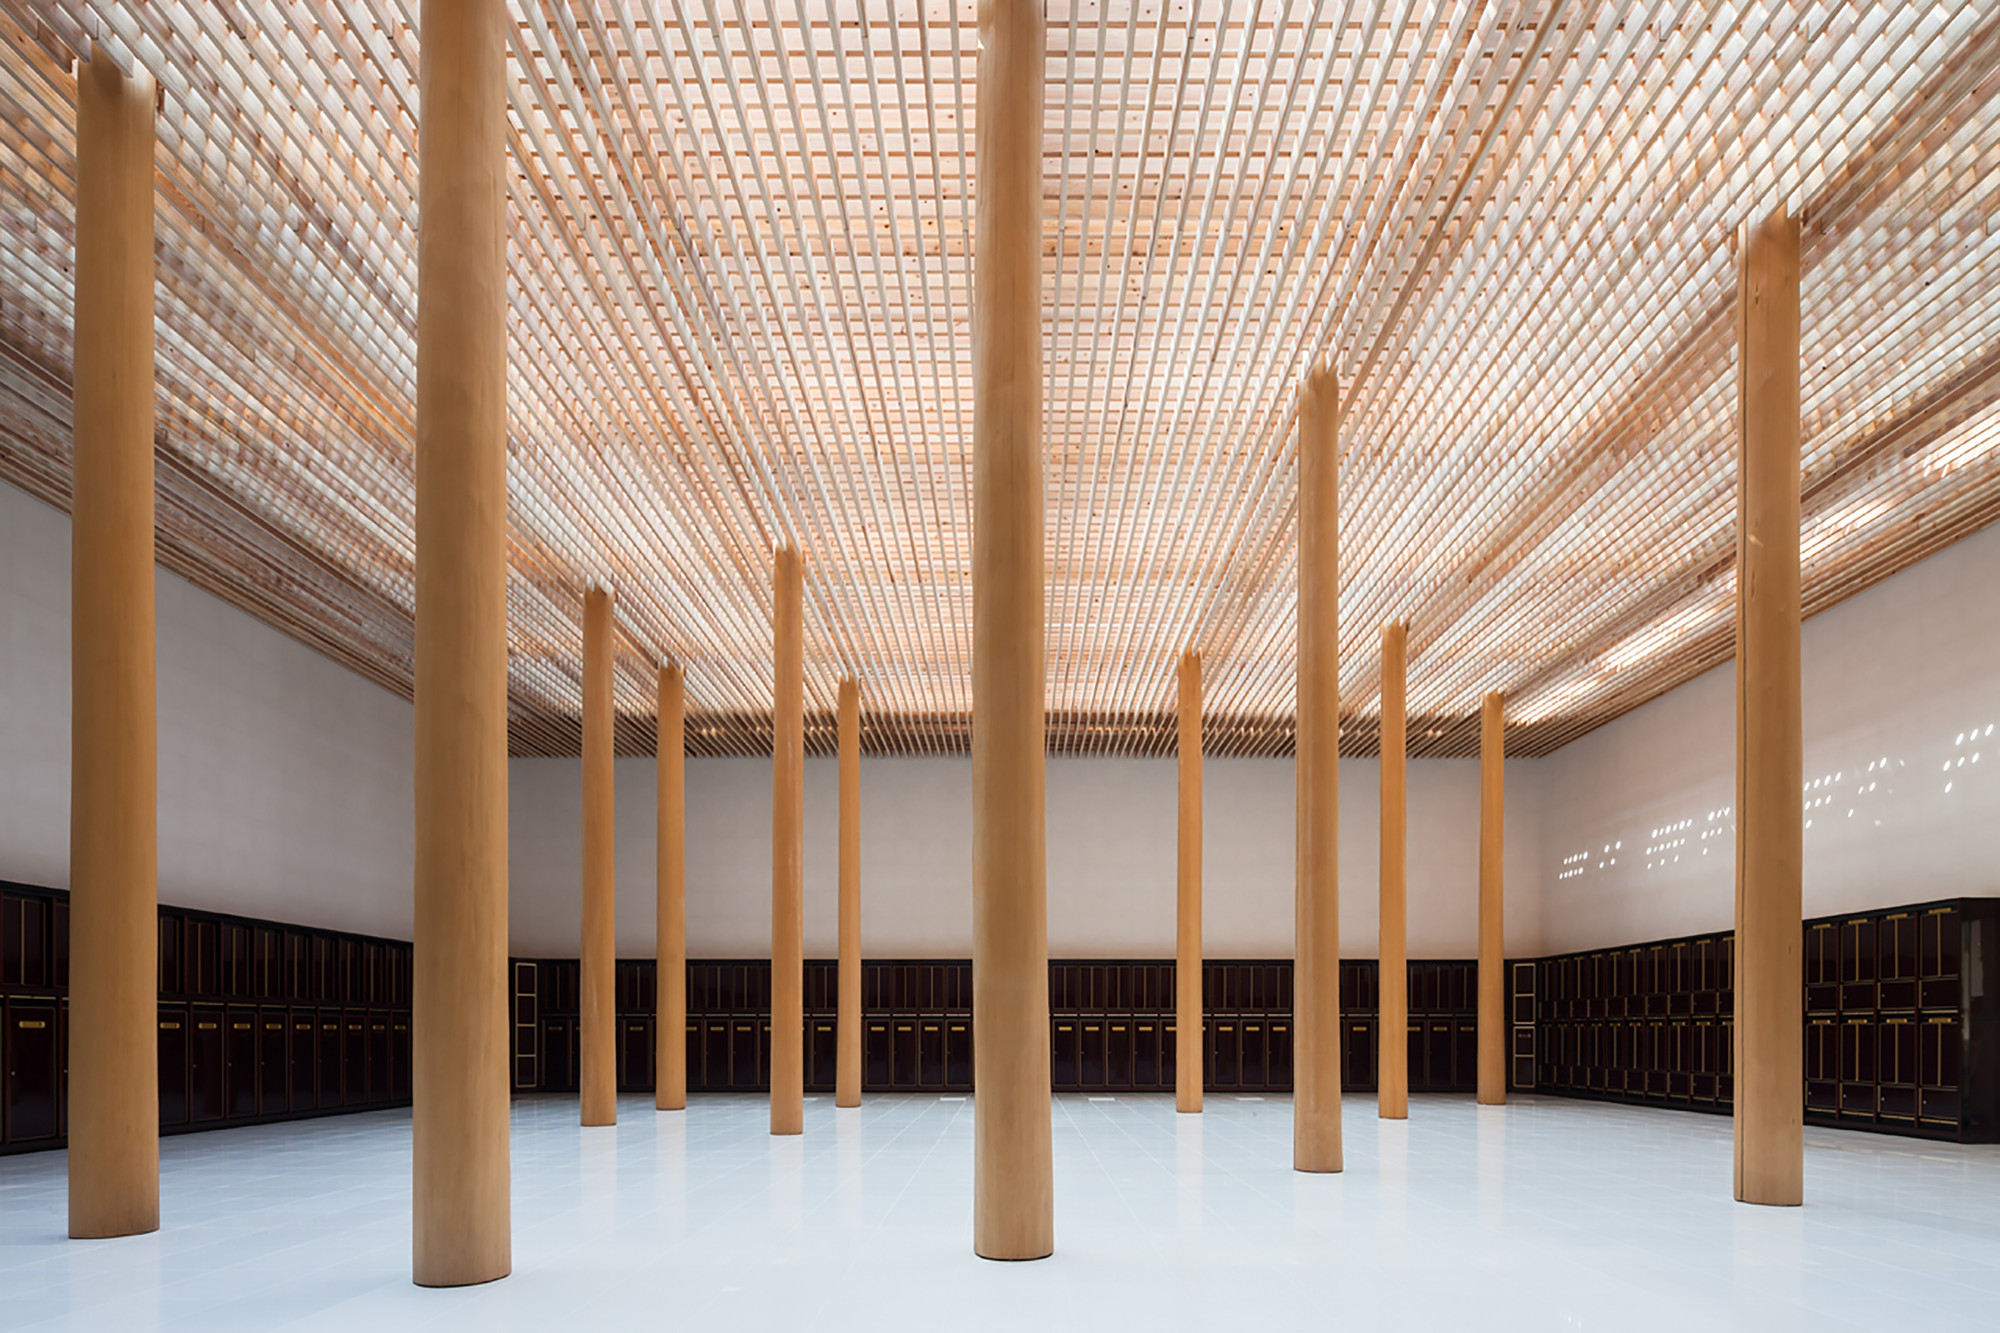 Myoenji columbarium furumori koichi architectural design for Architecture design